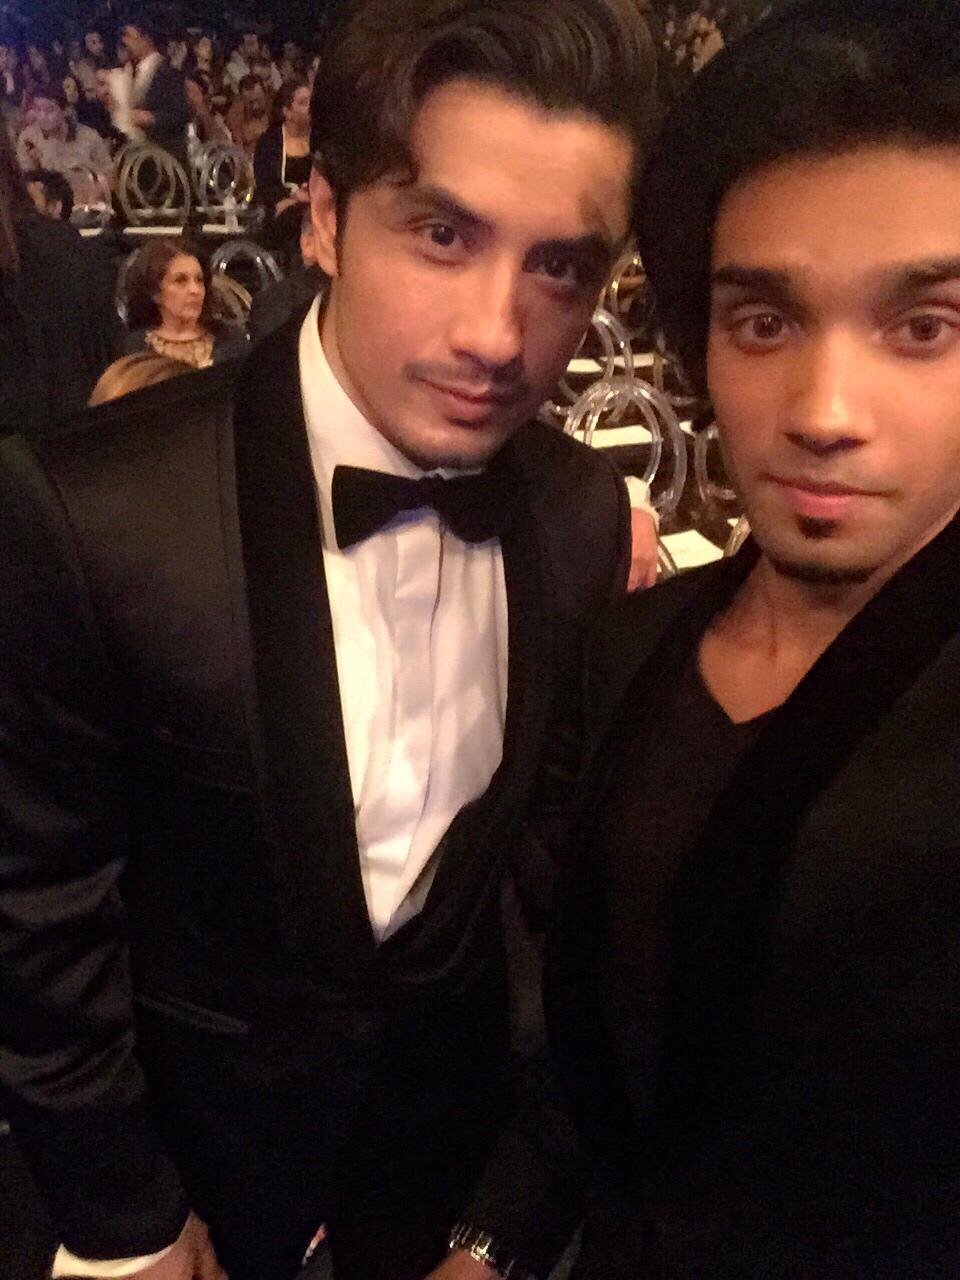 Ali Zafar & Aleem Zafar at Lux Style Awards 2015